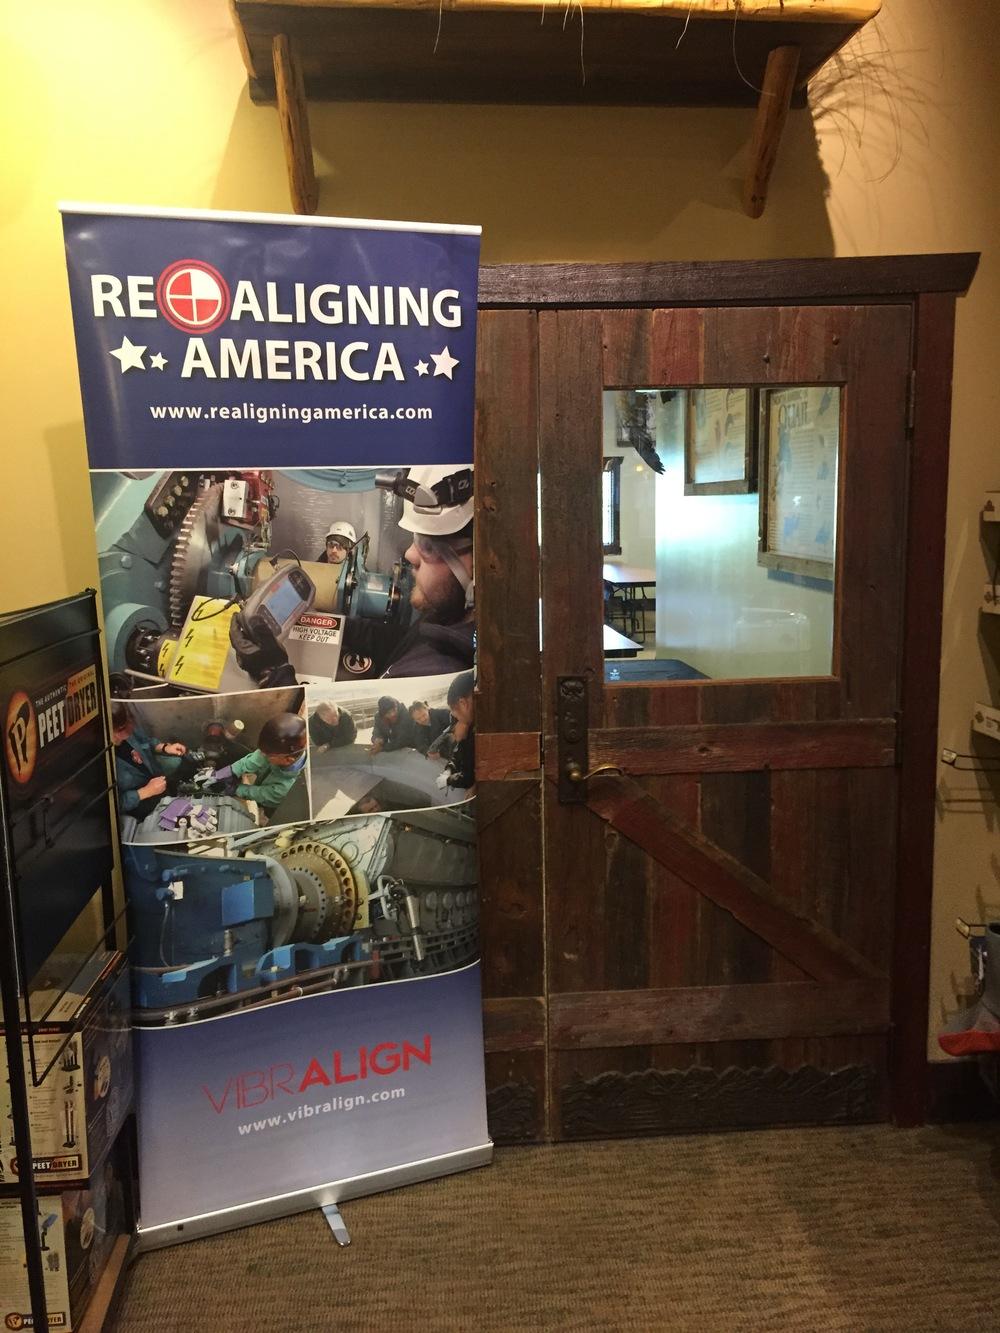 realigning-america-image-02.jpg